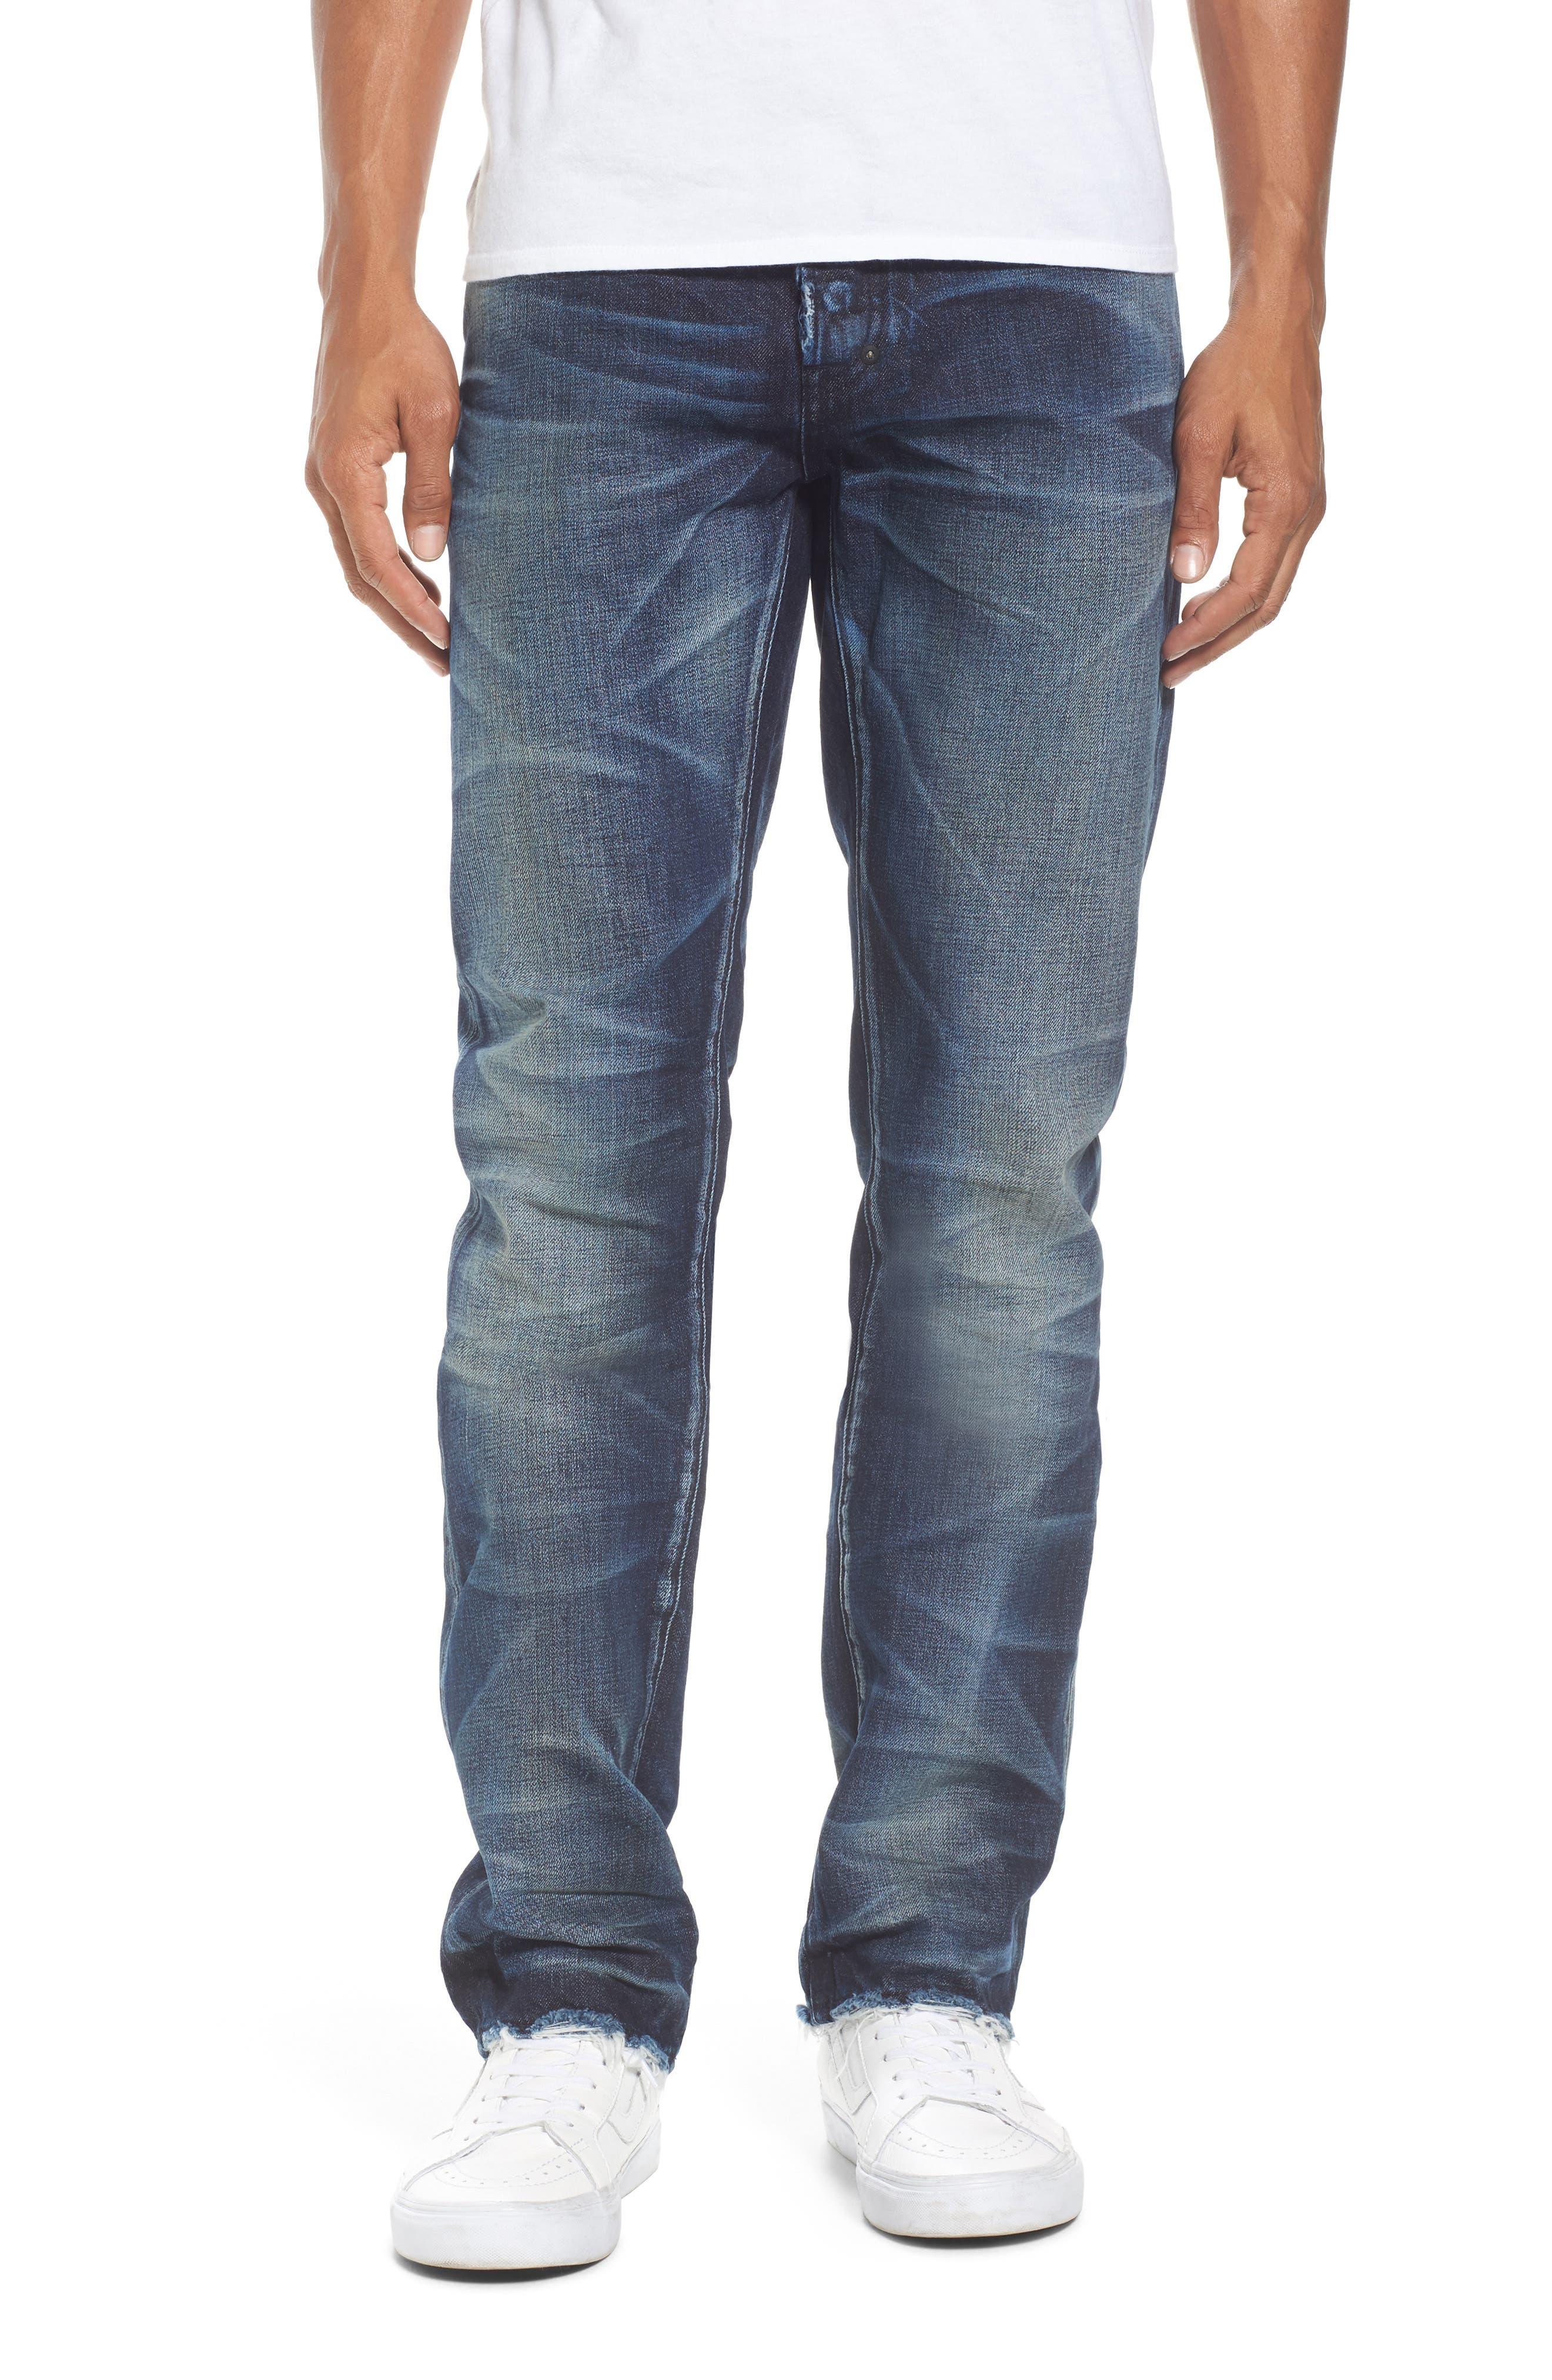 Demon Slim Straight Jeans,                             Main thumbnail 1, color,                             INDIGO